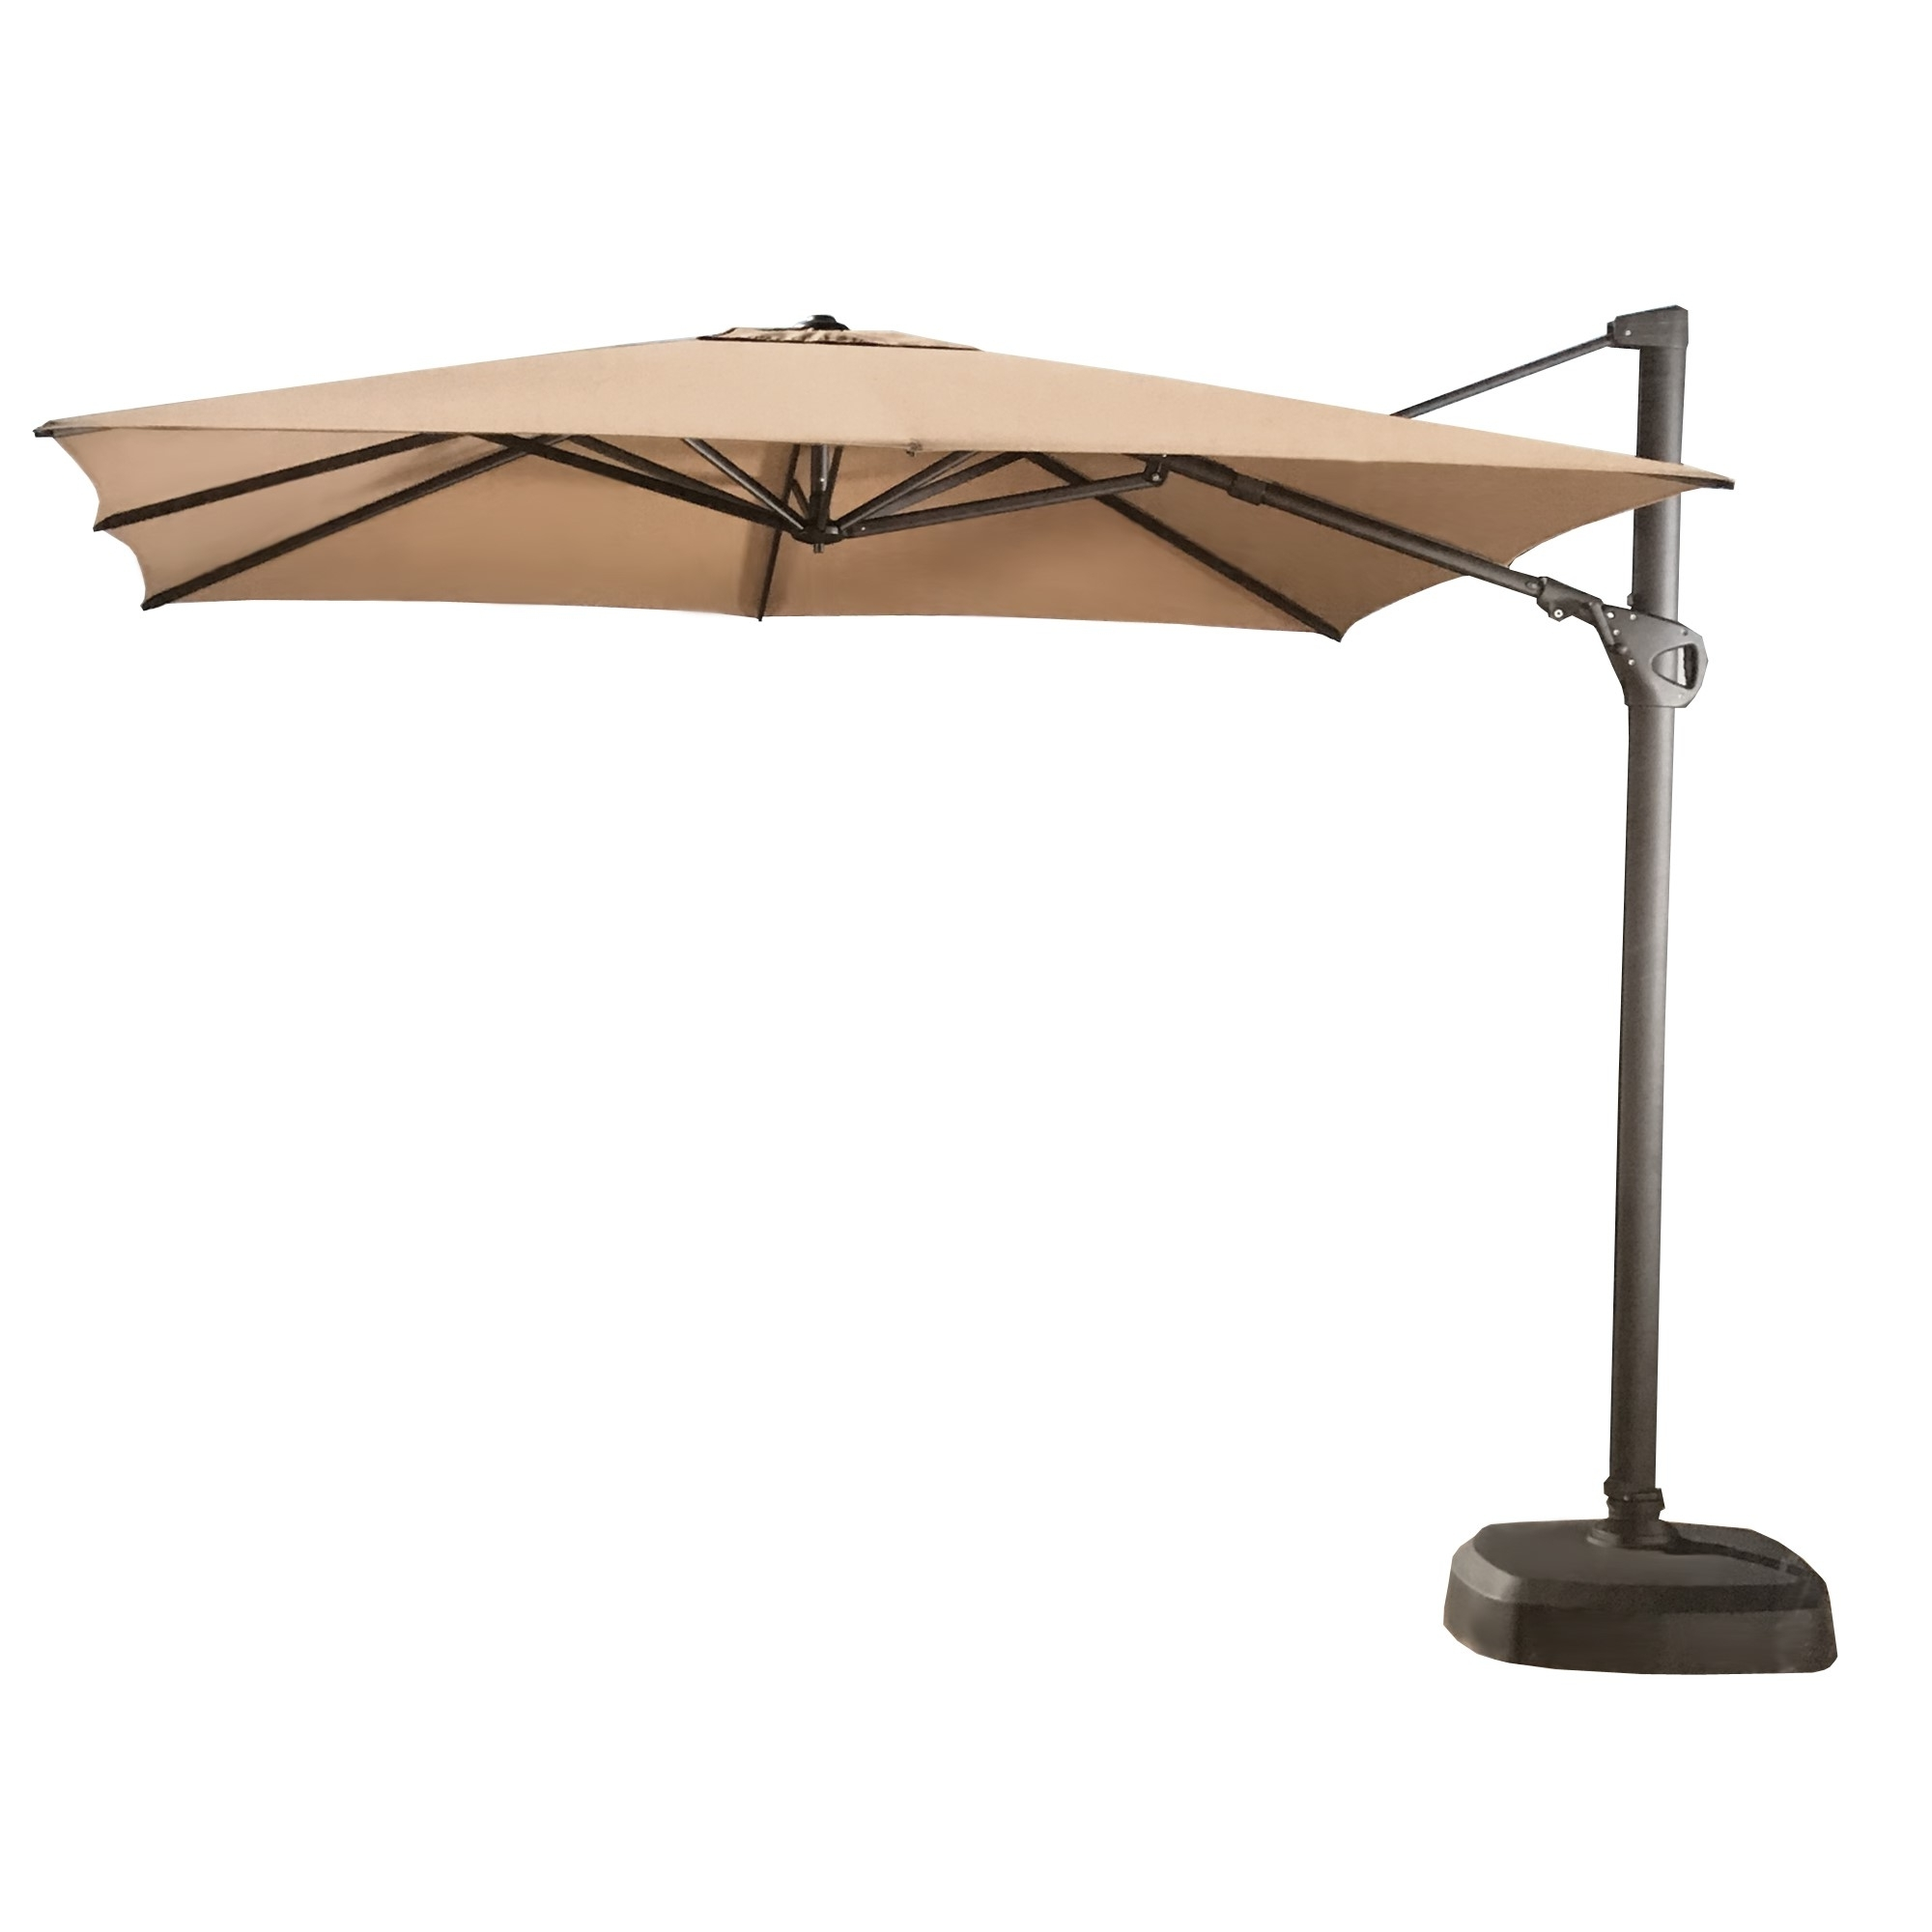 Preferred Costco Replacement Umbrella Canopy – Garden Winds Pertaining To Costco Cantilever Patio Umbrellas (Gallery 15 of 20)